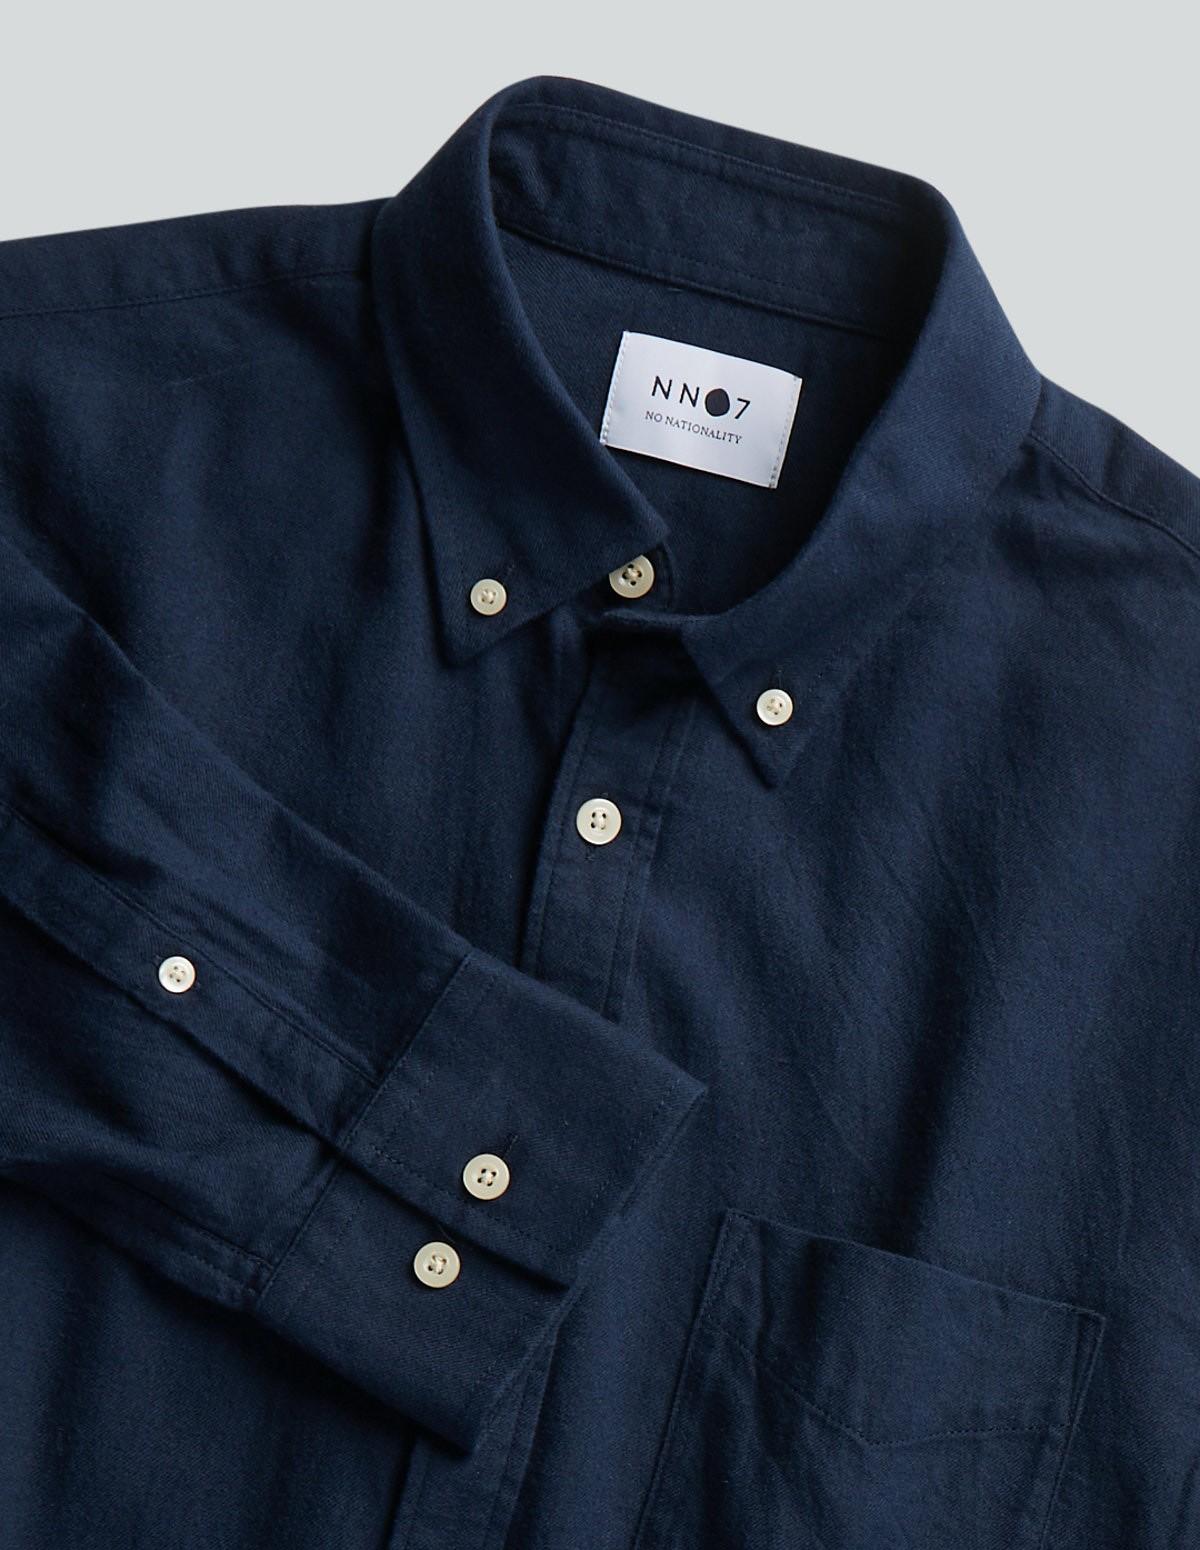 Nn07 Levon Shirt - 200 NAVY